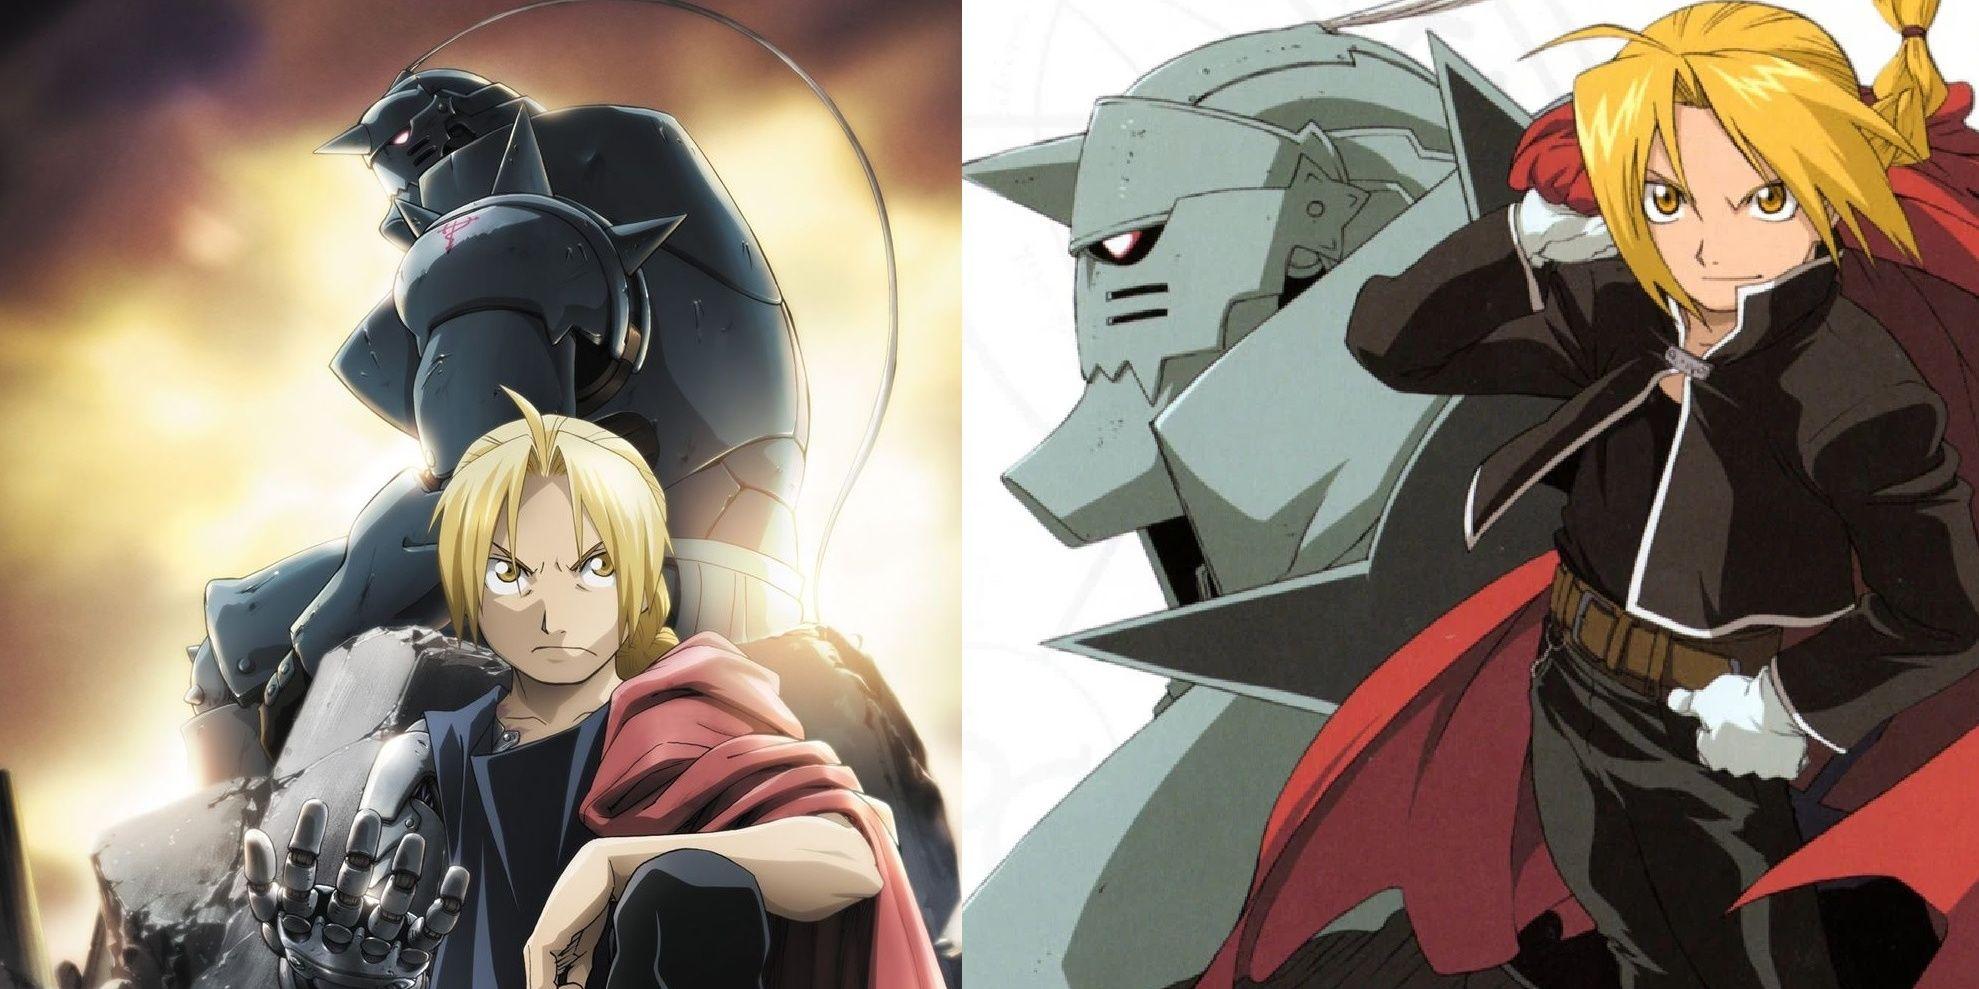 Fullmetal Alchemist Vs. Brotherhood: What's the Difference? | CBR